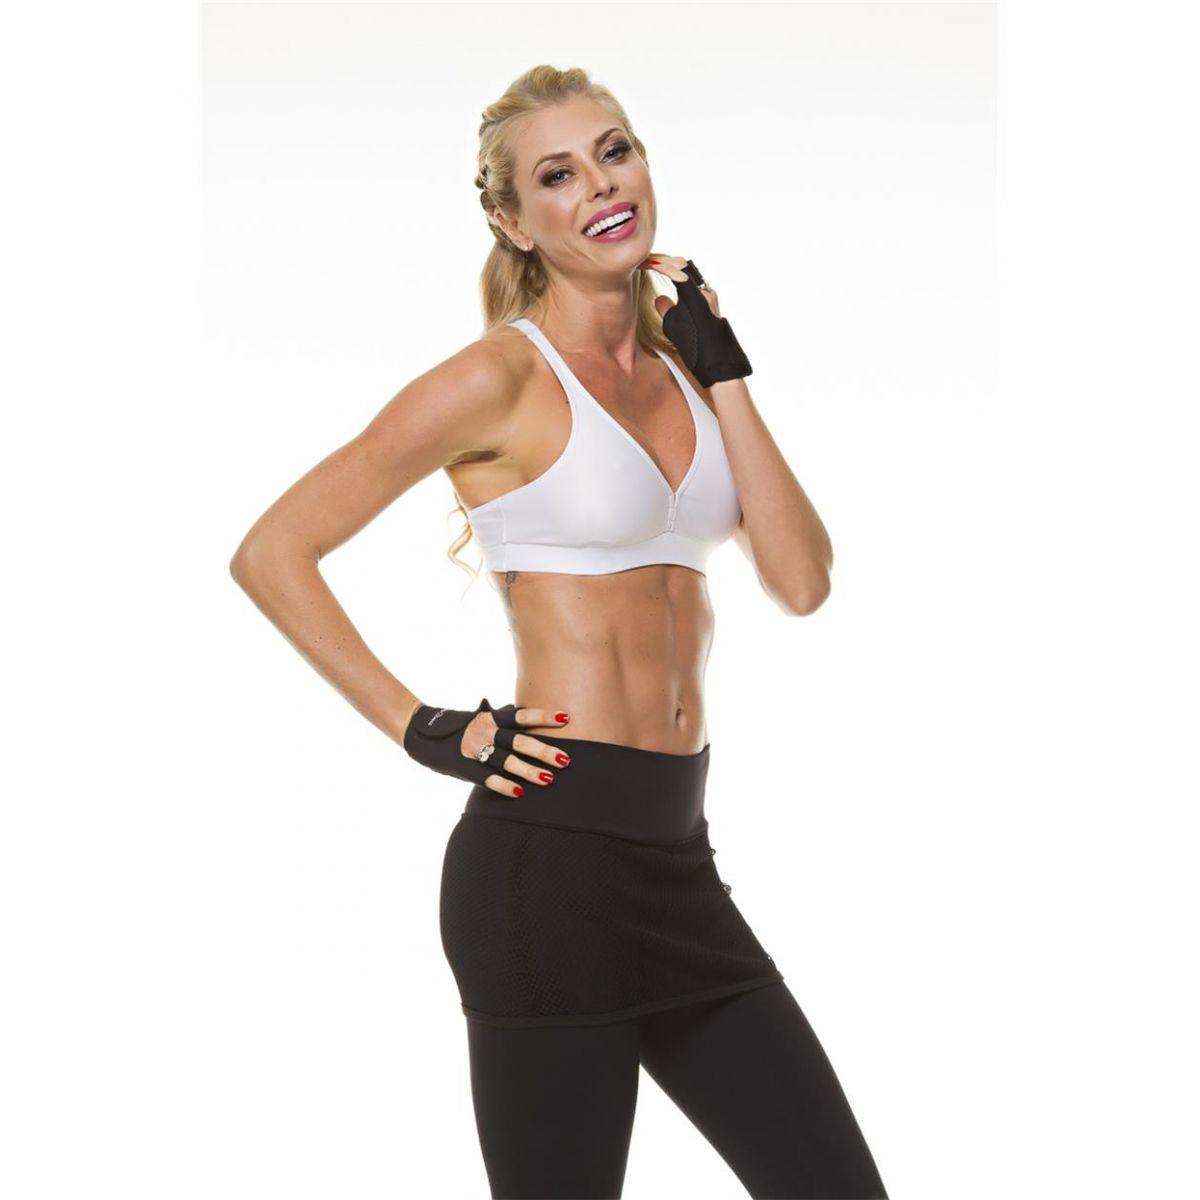 Top Cirrê Branco Nadador Diva Fitness